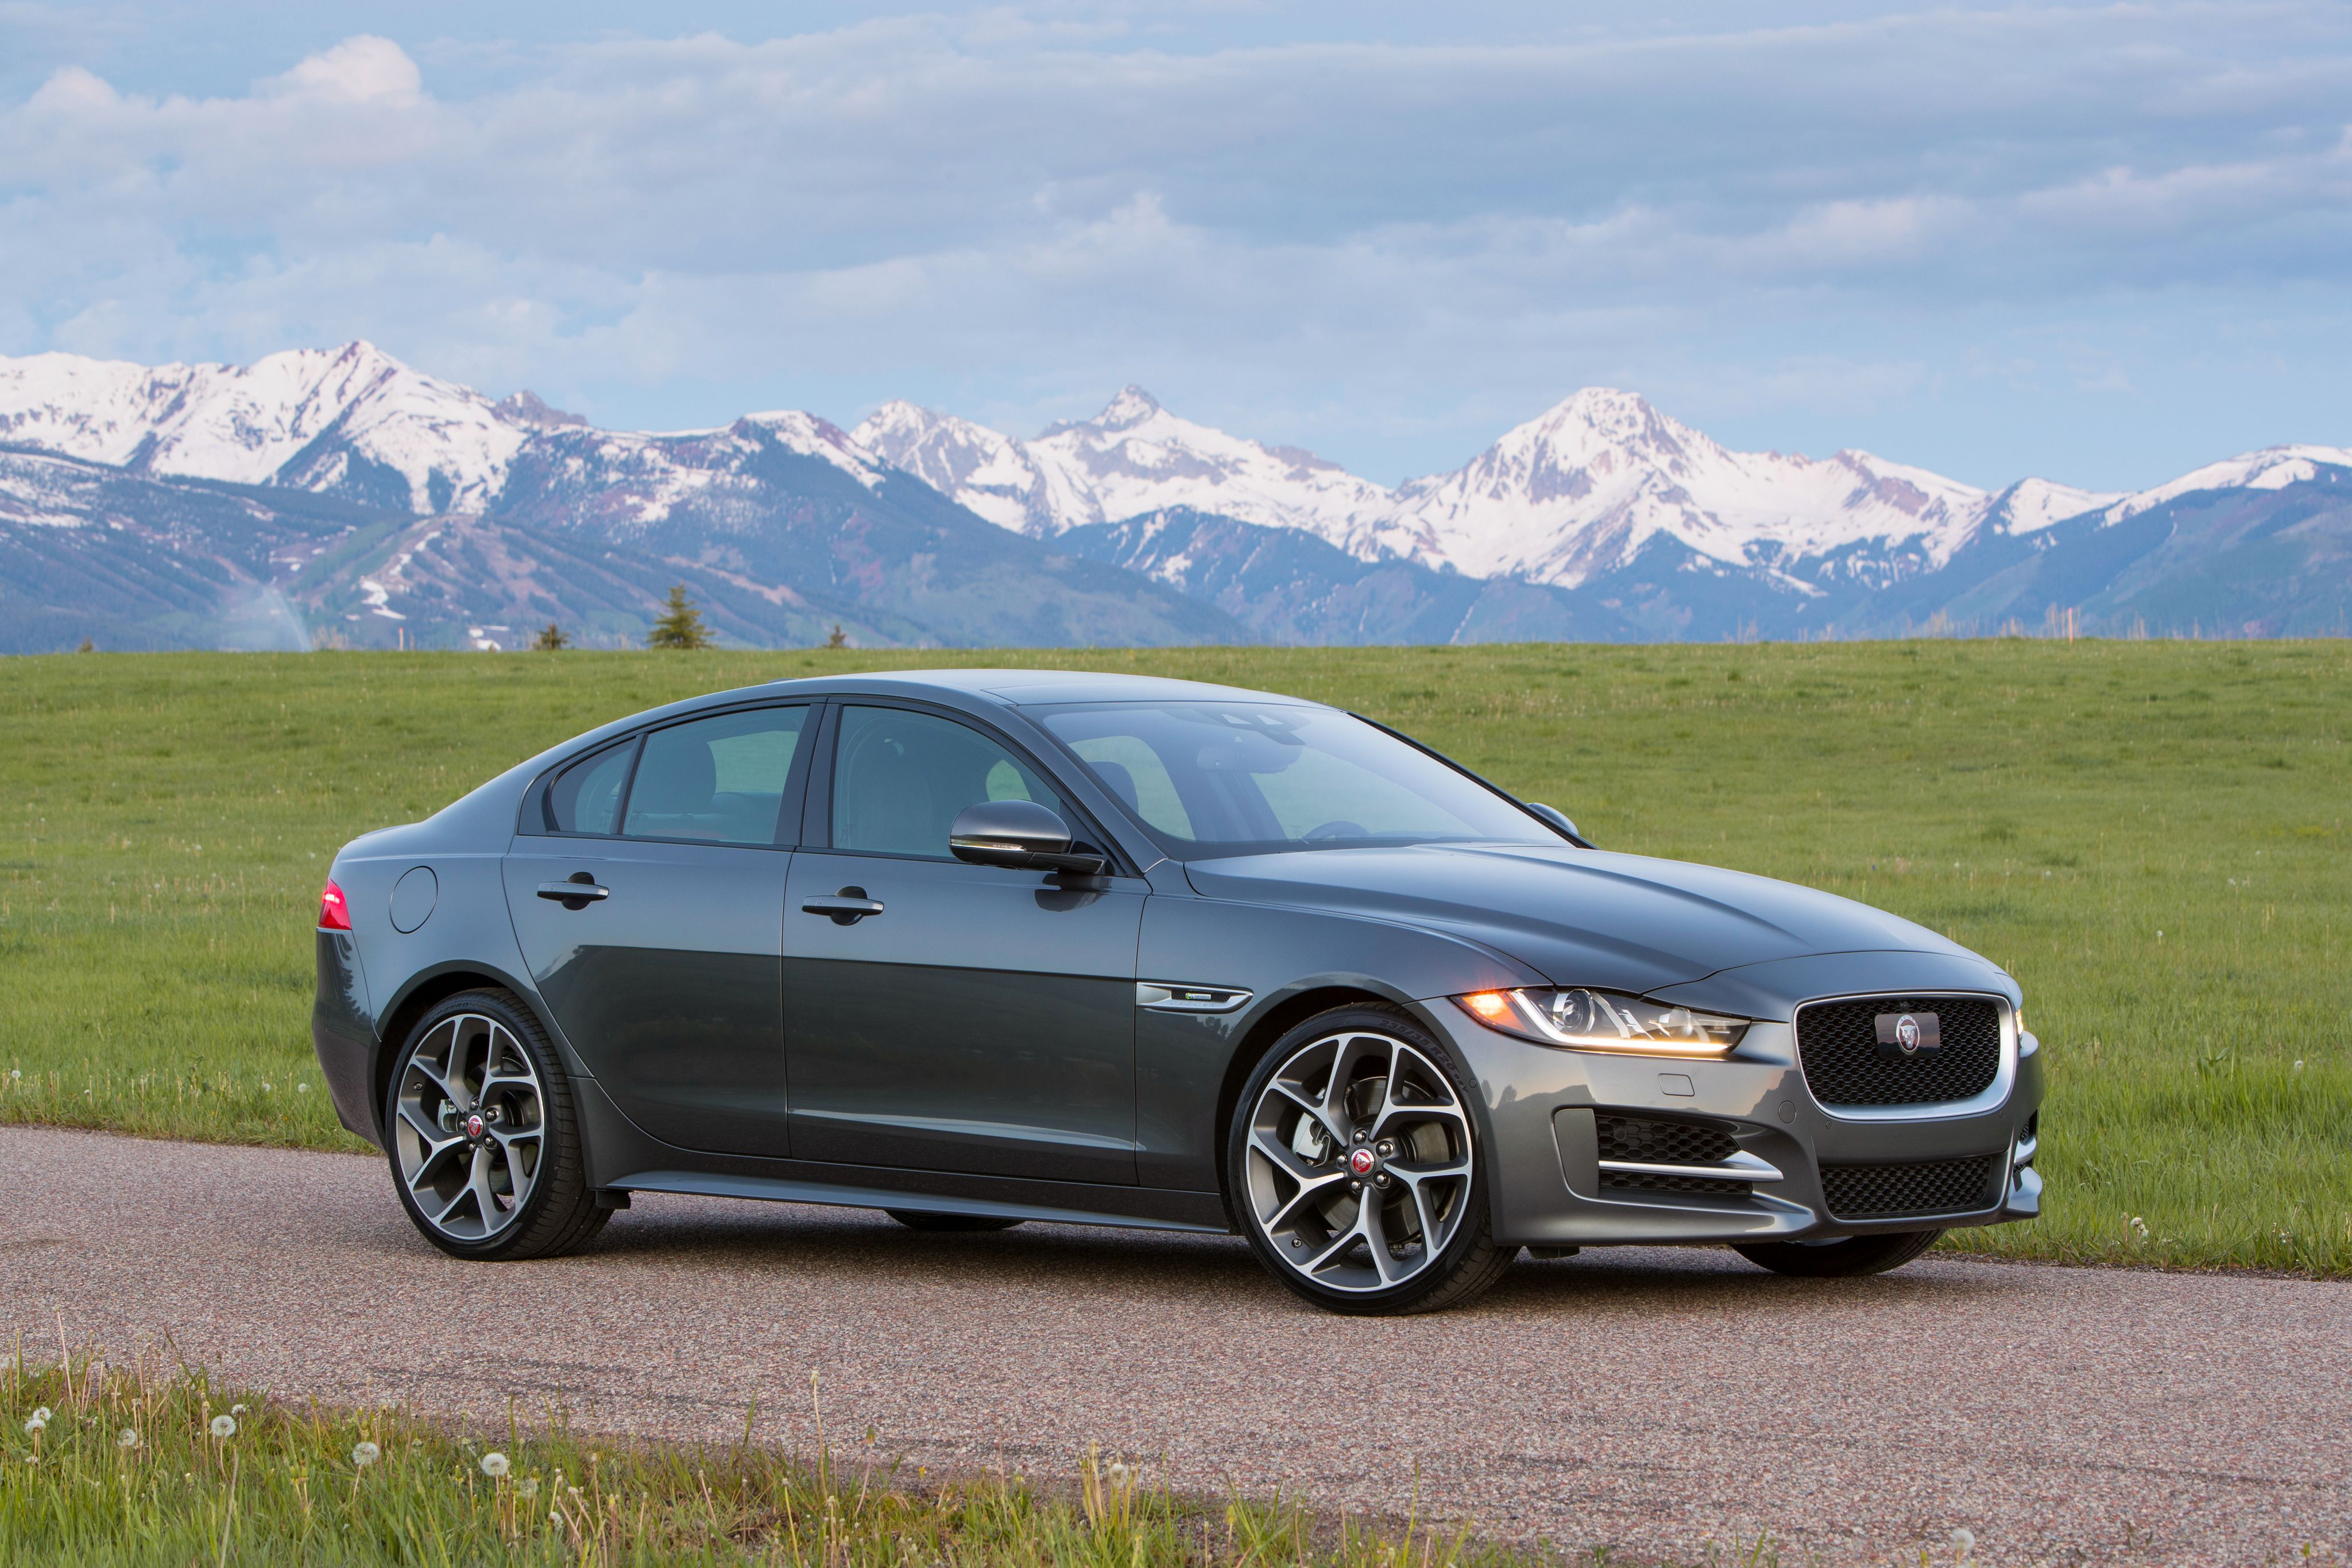 used xf sale for lmc premium supercharged vehicle luxury jaguar